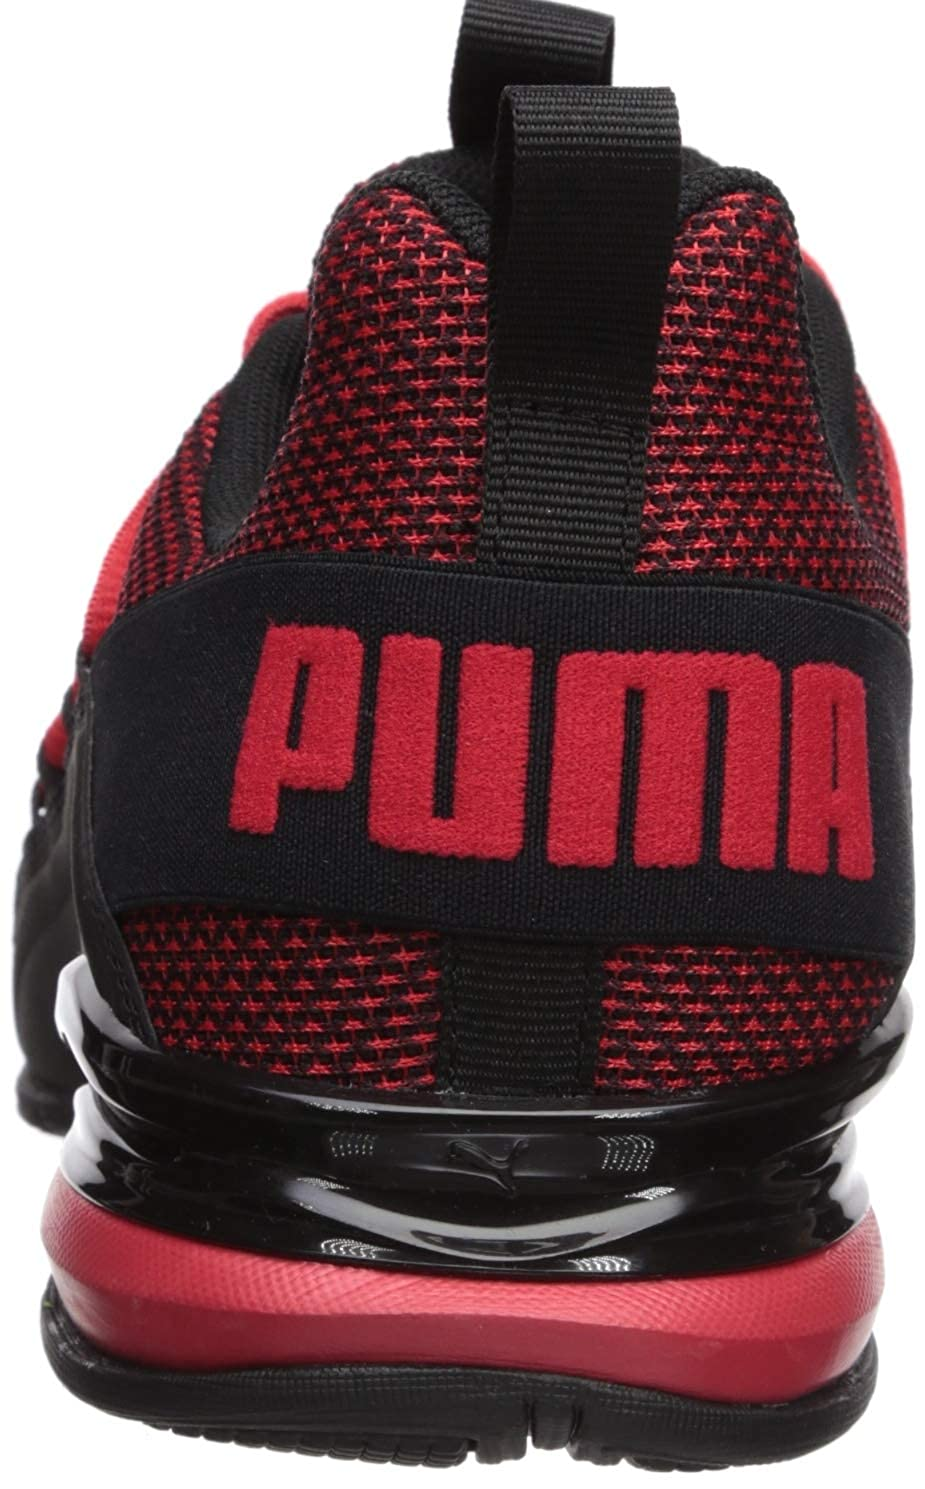 eaa4e50092c1c PUMA Men's Axelion Sneaker highriskred-Black 10 W US